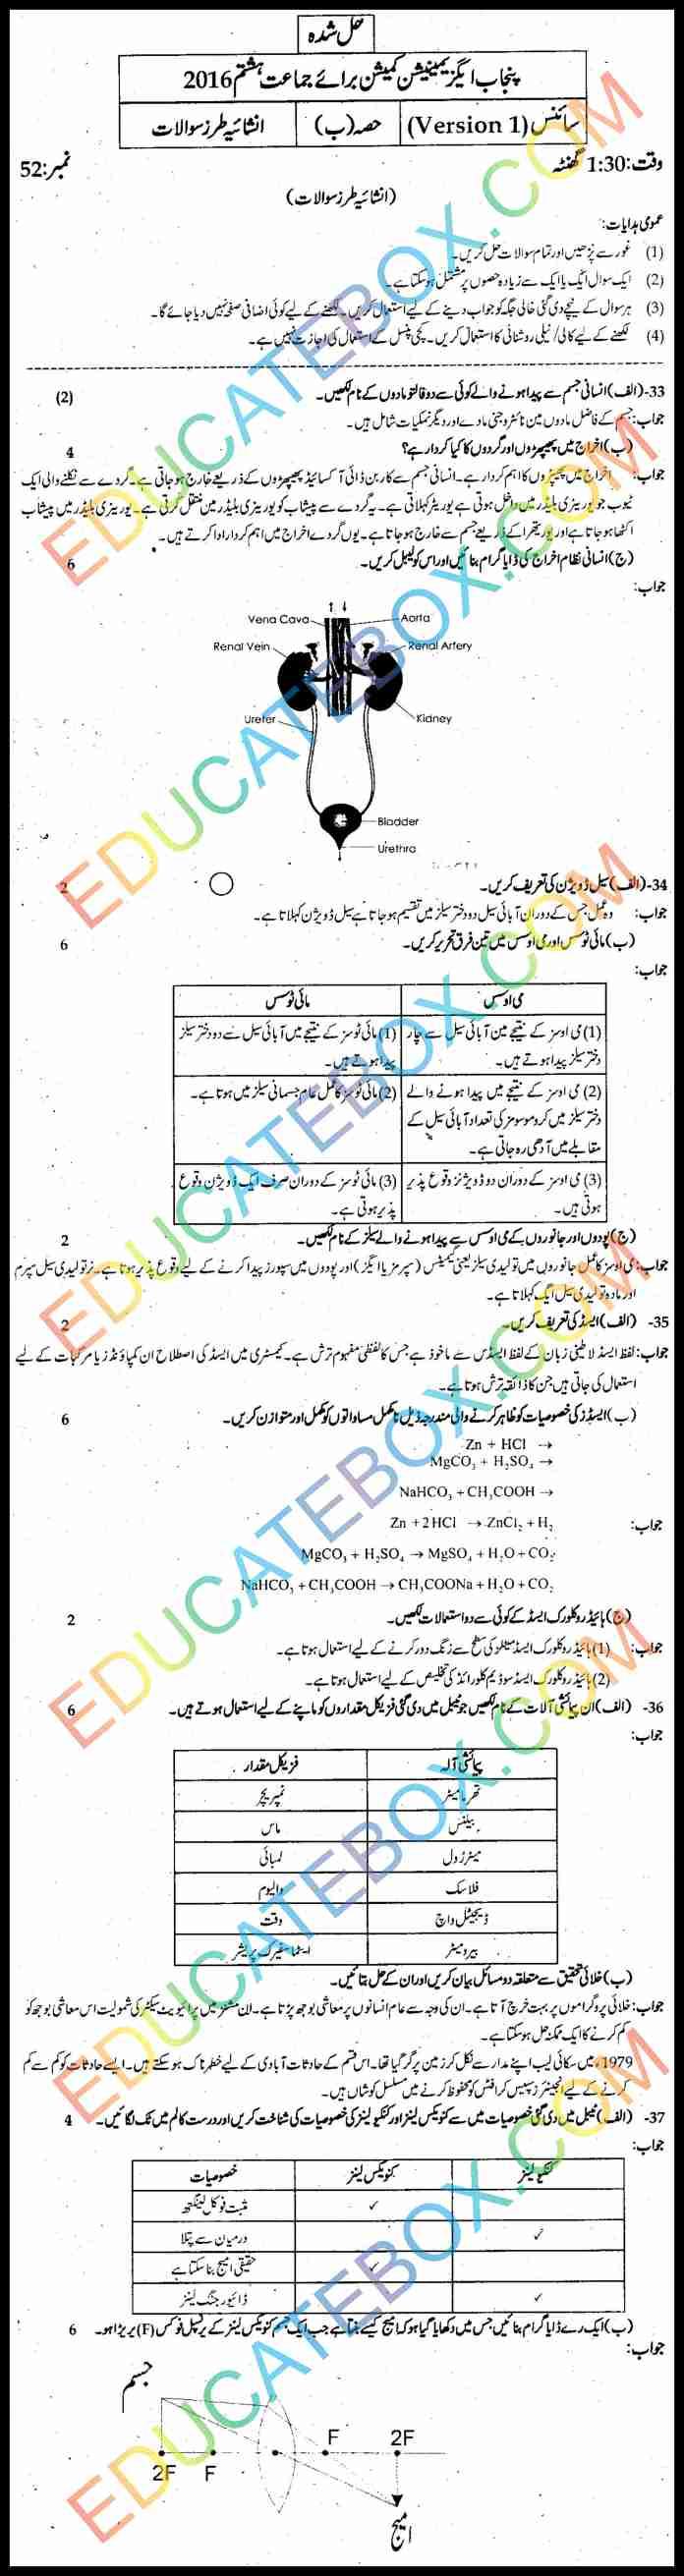 Past Paper 8th Class Science 2016 Solved Paper Punjab Board (PEC) Subjective Type Version 1 اپ ٹو ڈیٹ پیپر آٹھویں کلاس سائنس 2016 حل شدہ پیپر پنجاب بورڈ سبجیکٹیو ٹائپ۔ ورژن1